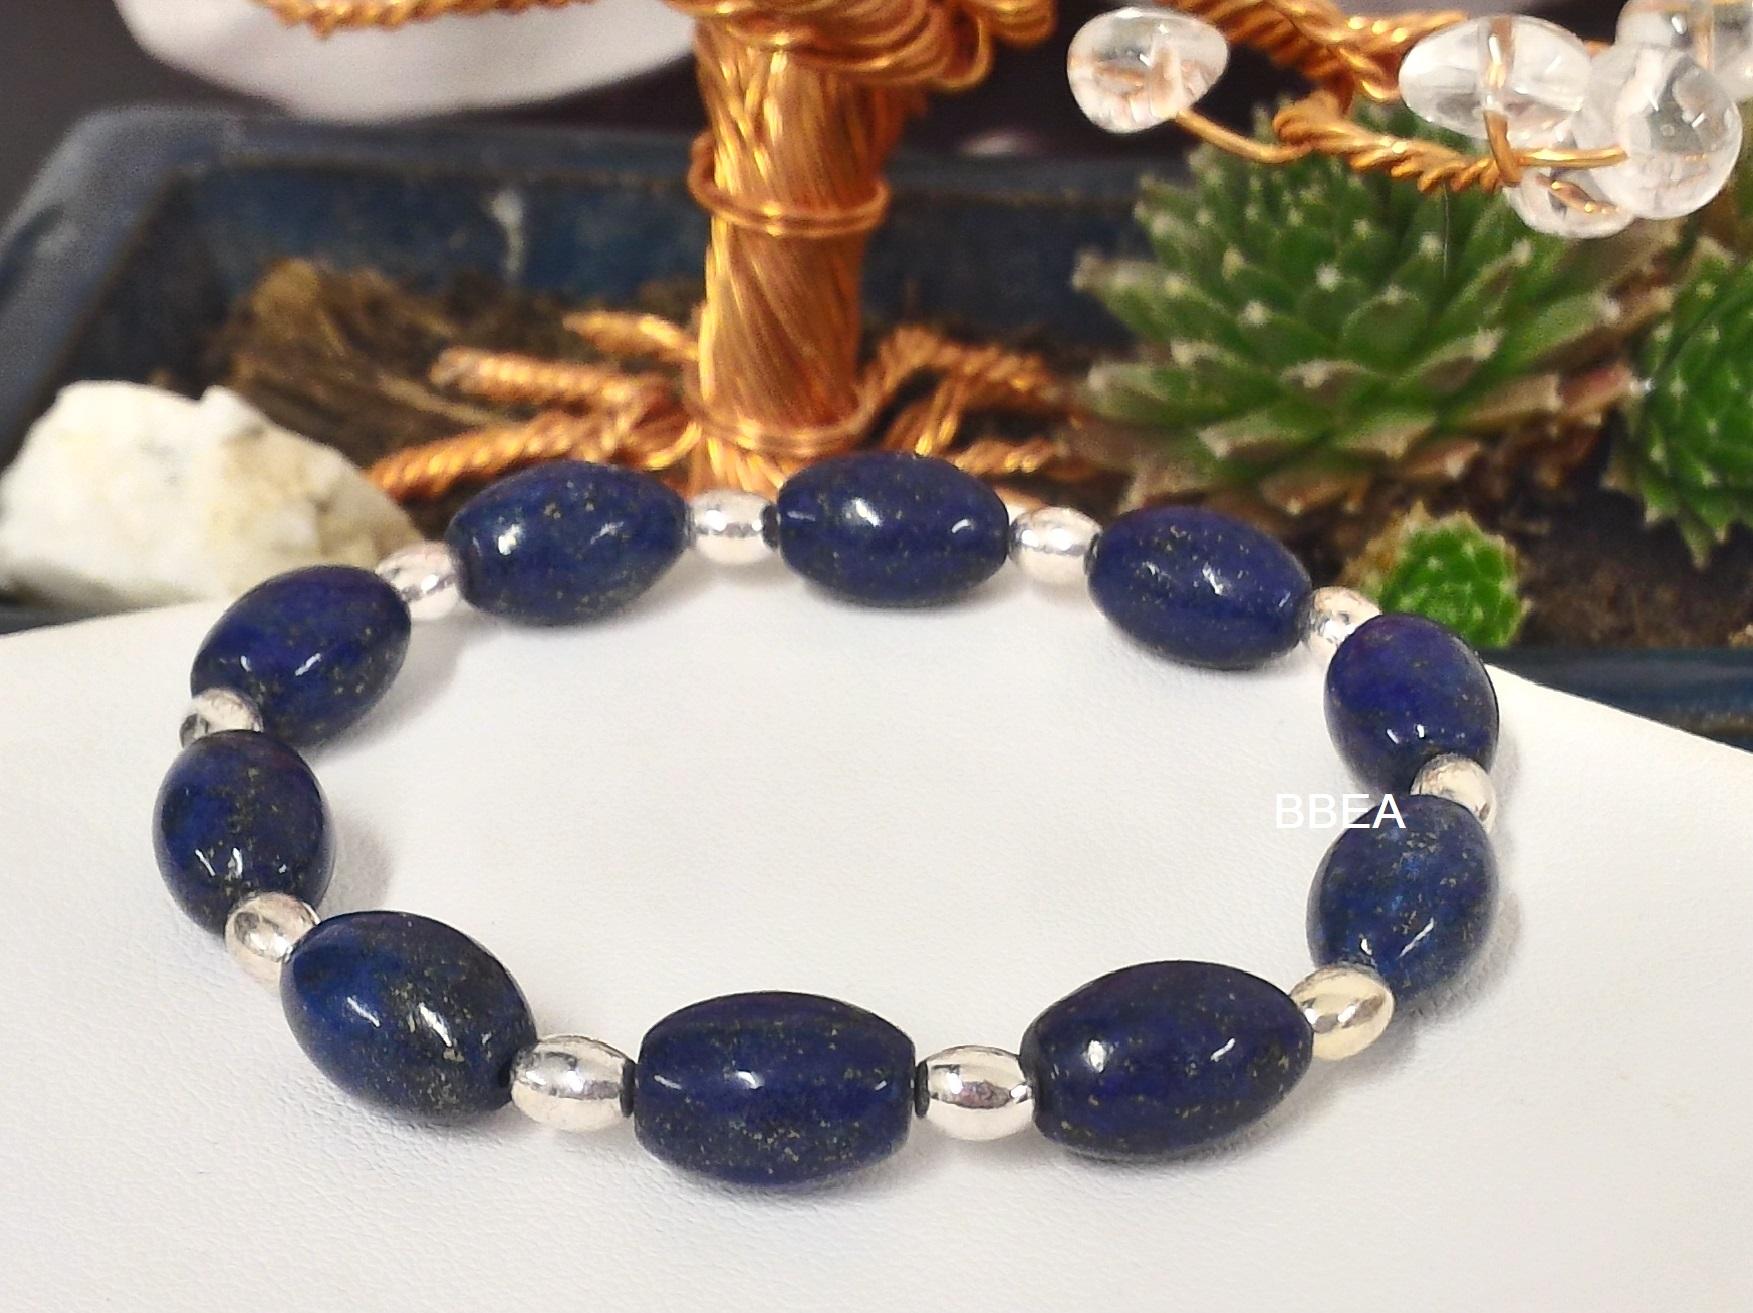 Bracelet lapis lazuli 3 1